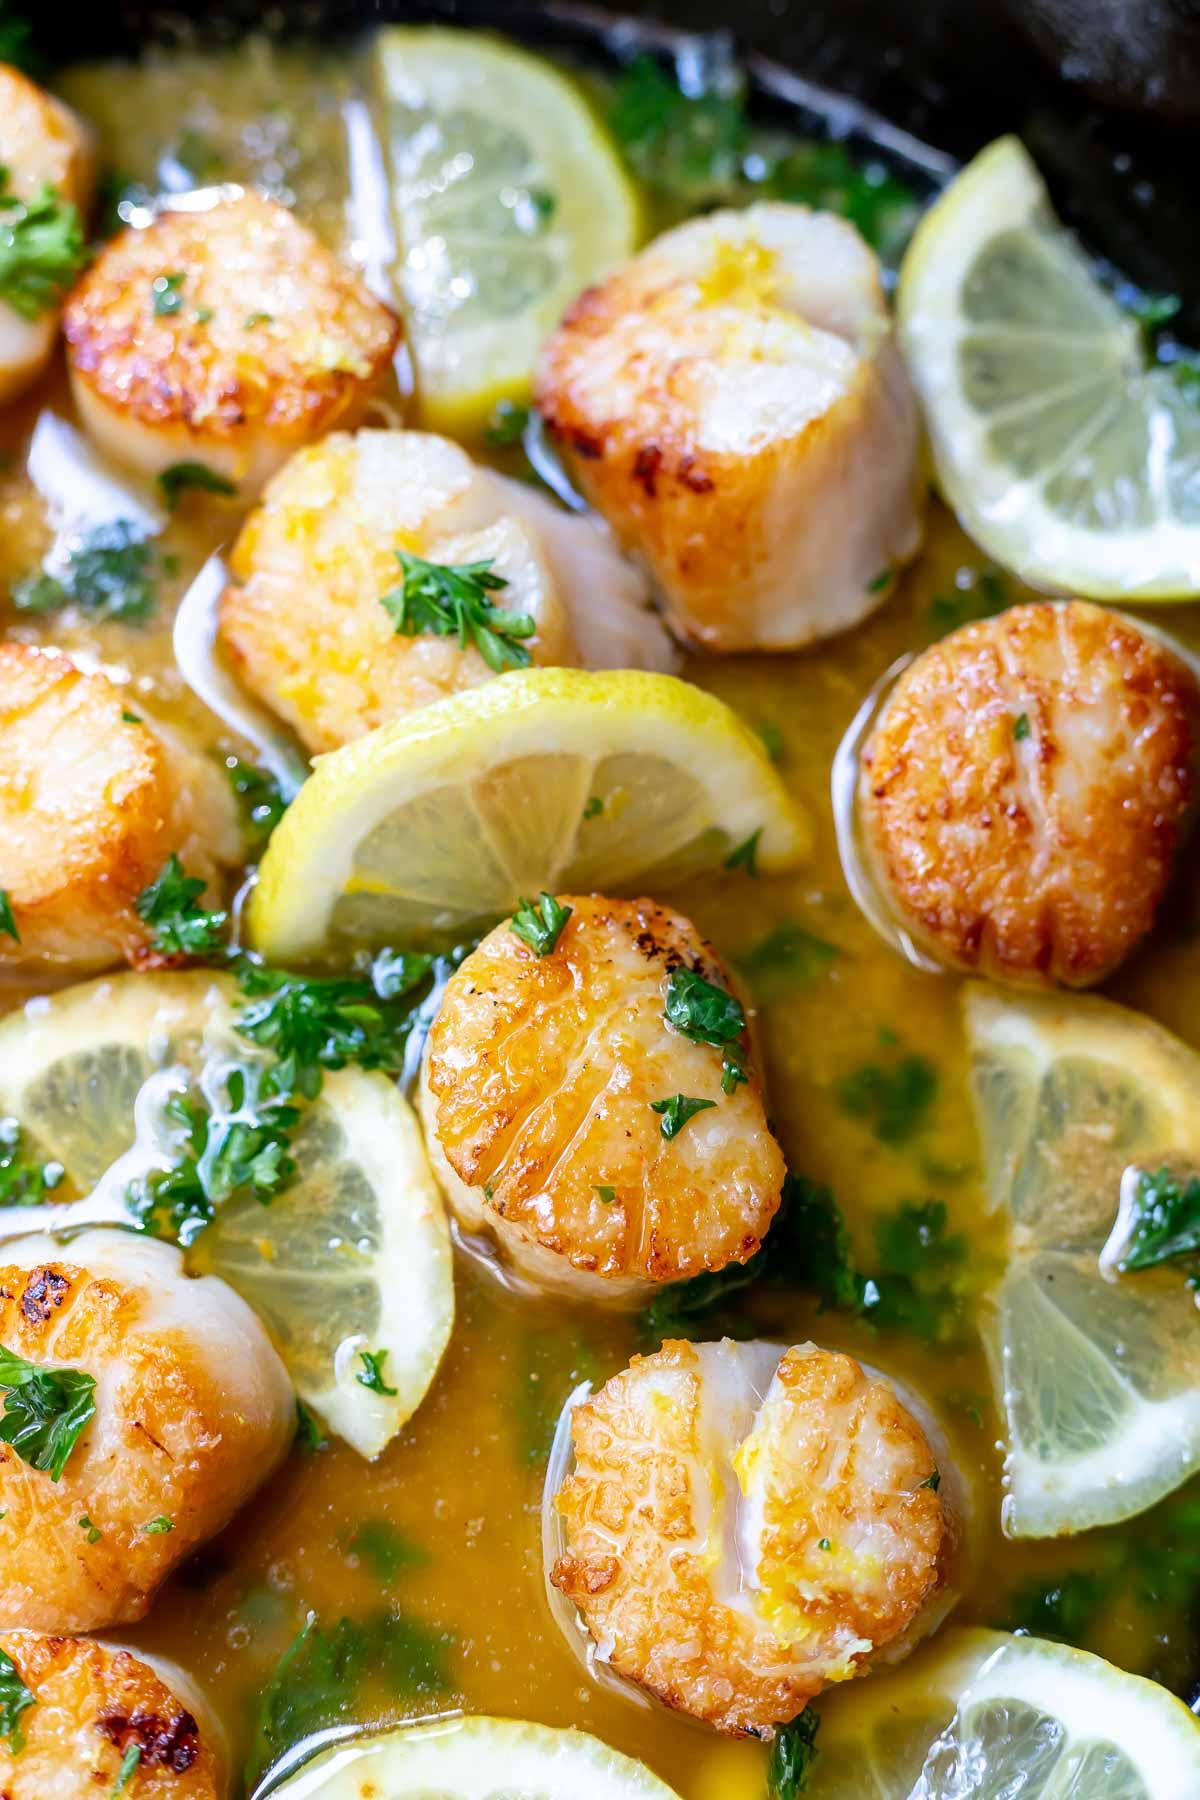 seared scallops in a fresh lemon butter parsley sauce